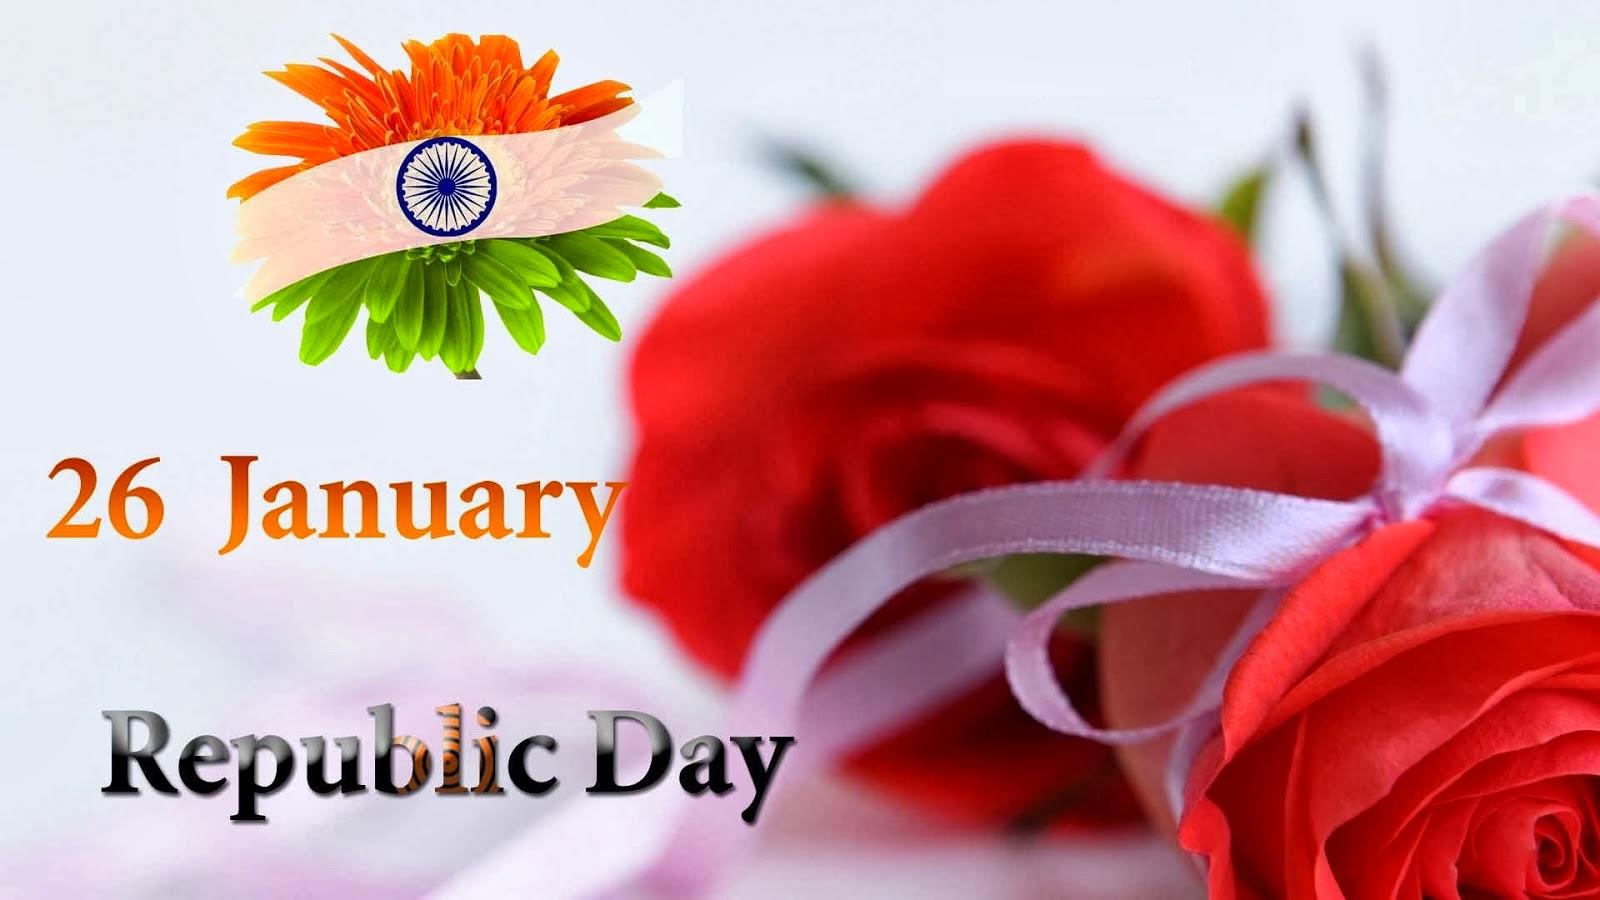 Happy republic day a very happy republic day to all my friends happy republic day a very happy republic day to all my friends m4hsunfo